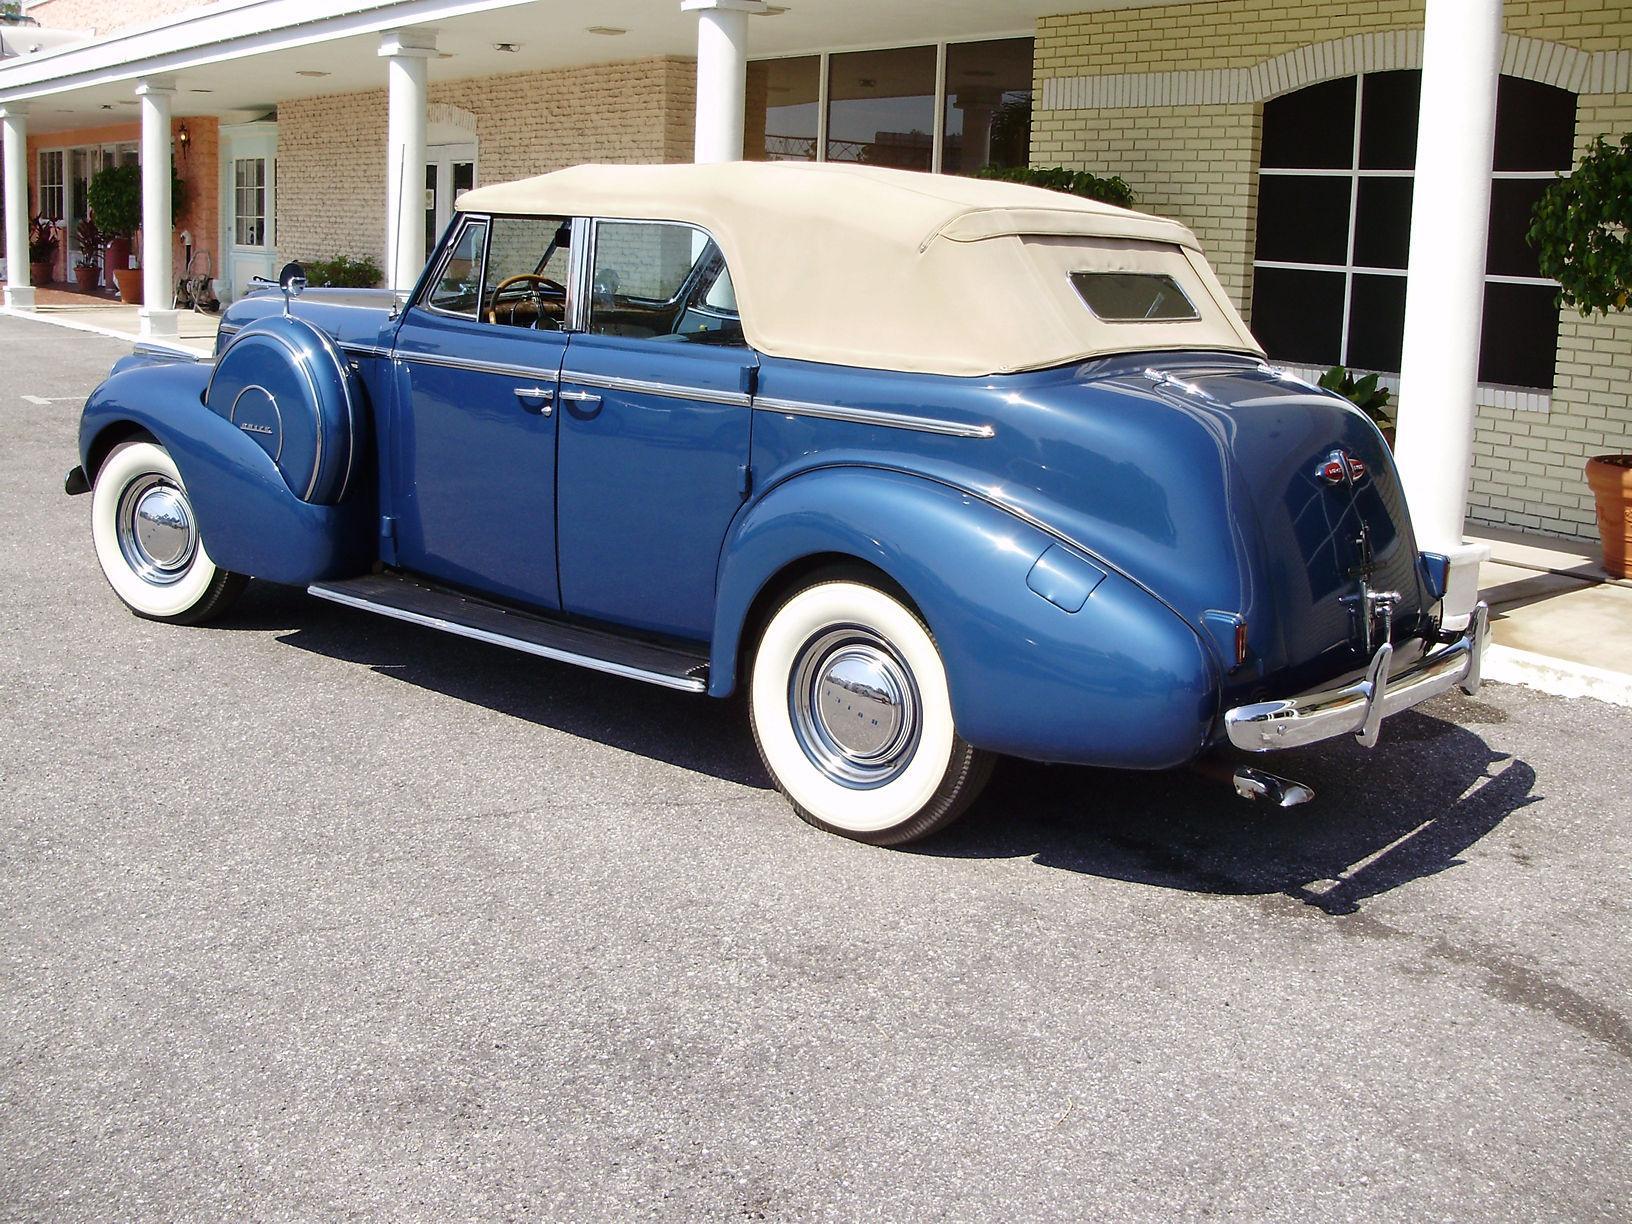 1940 BUICK CENTURY CONVERTIBLE SEDAN - Vintage Motors of Sarasota Inc. #15